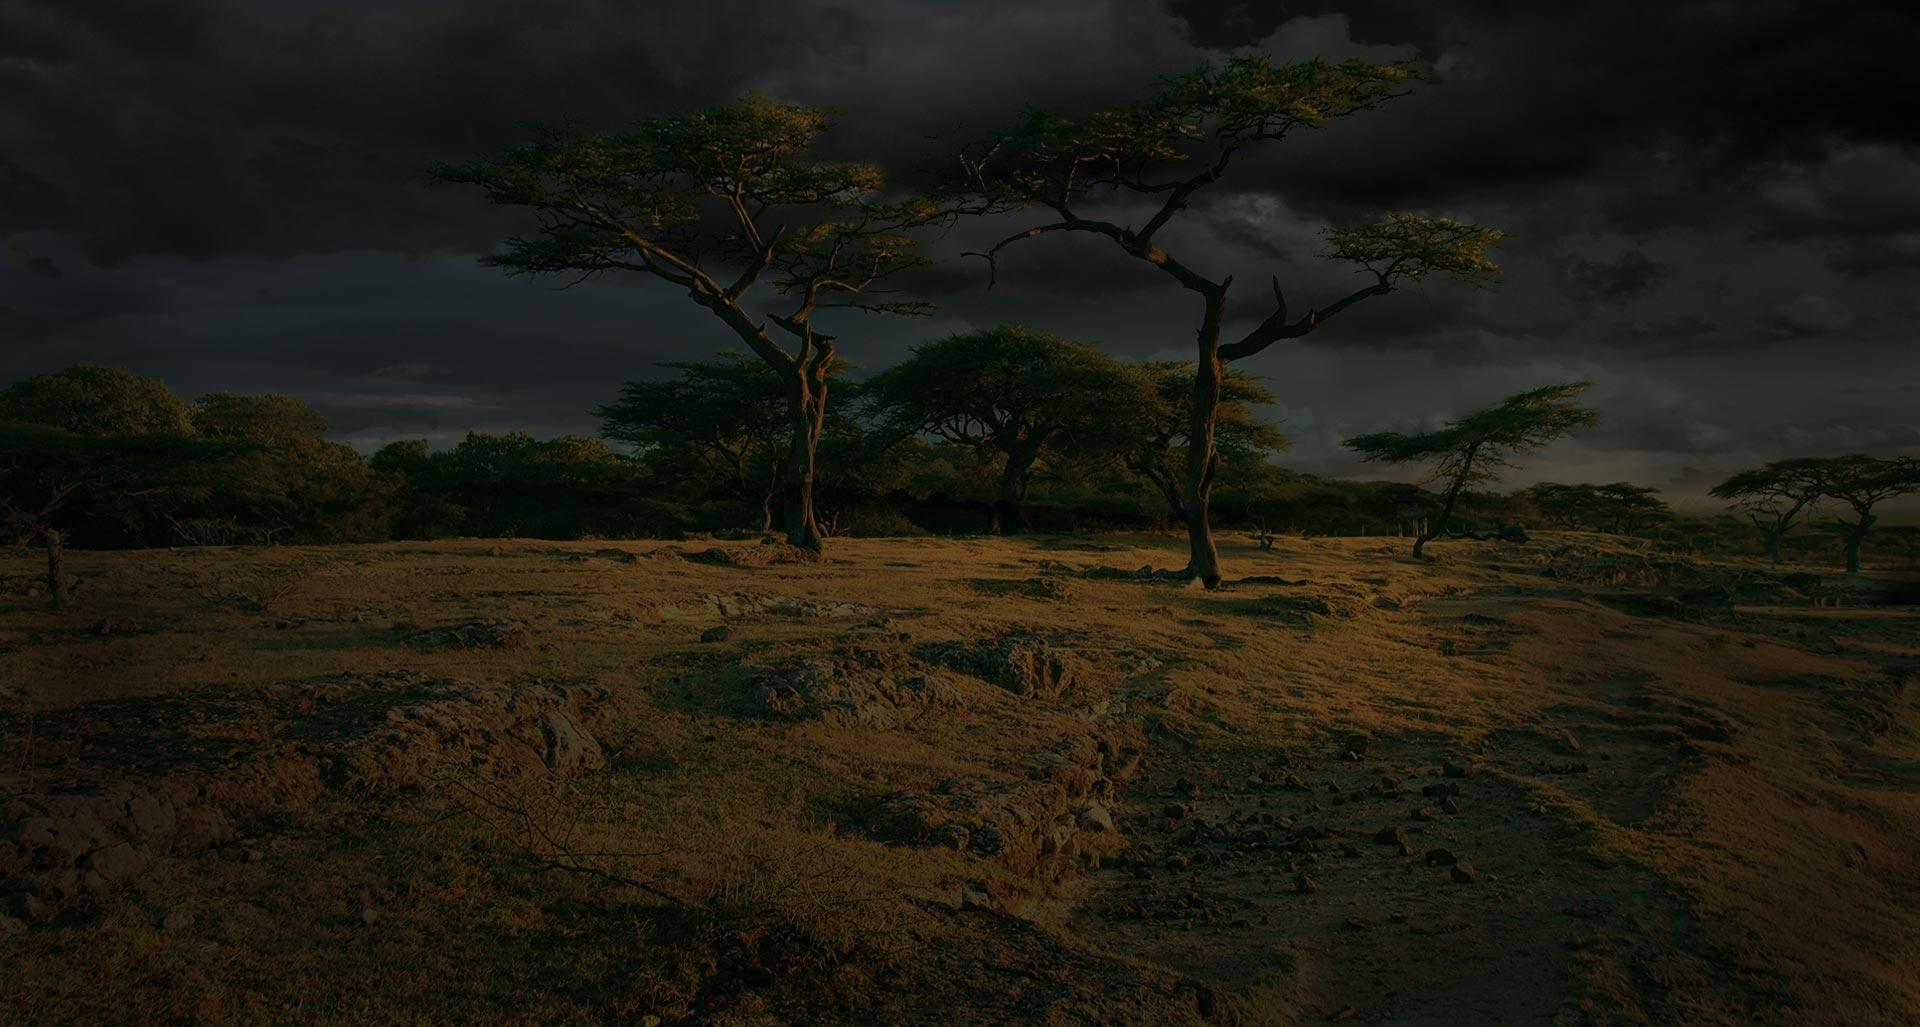 parallax background